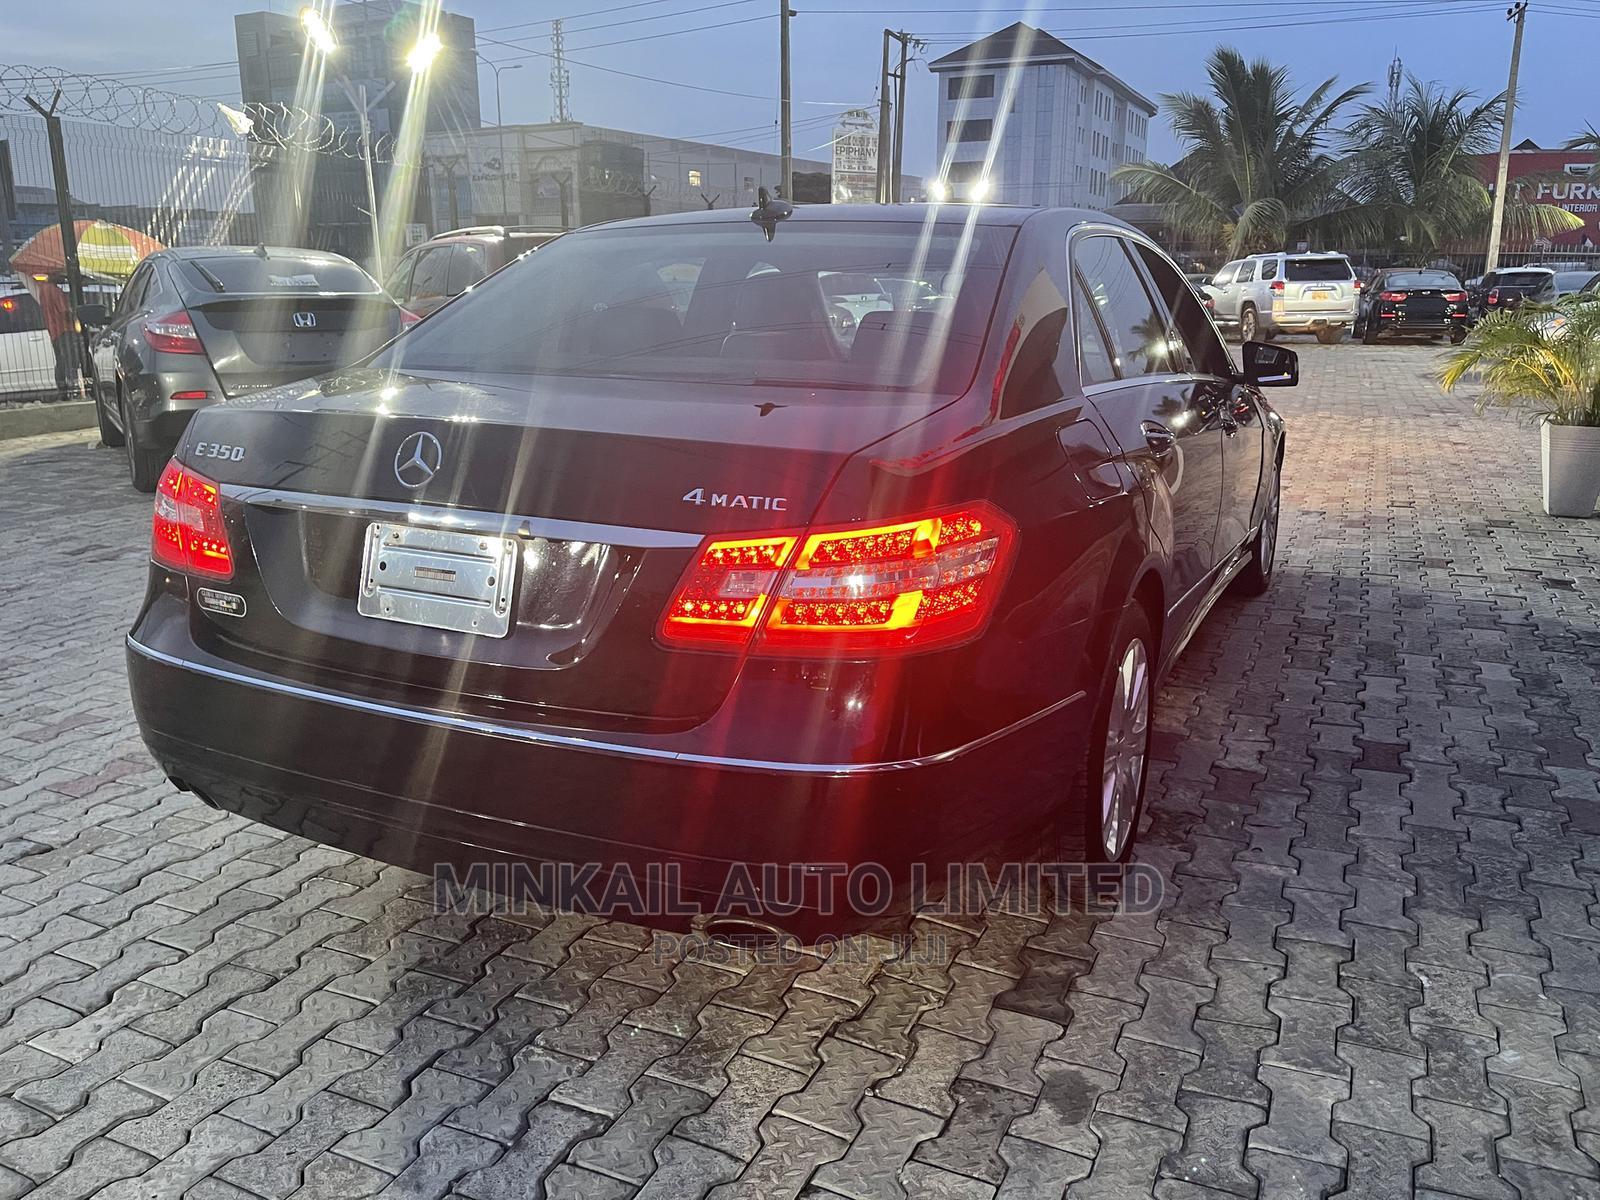 Mercedes-Benz E350 2012 Black   Cars for sale in Lekki, Lagos State, Nigeria